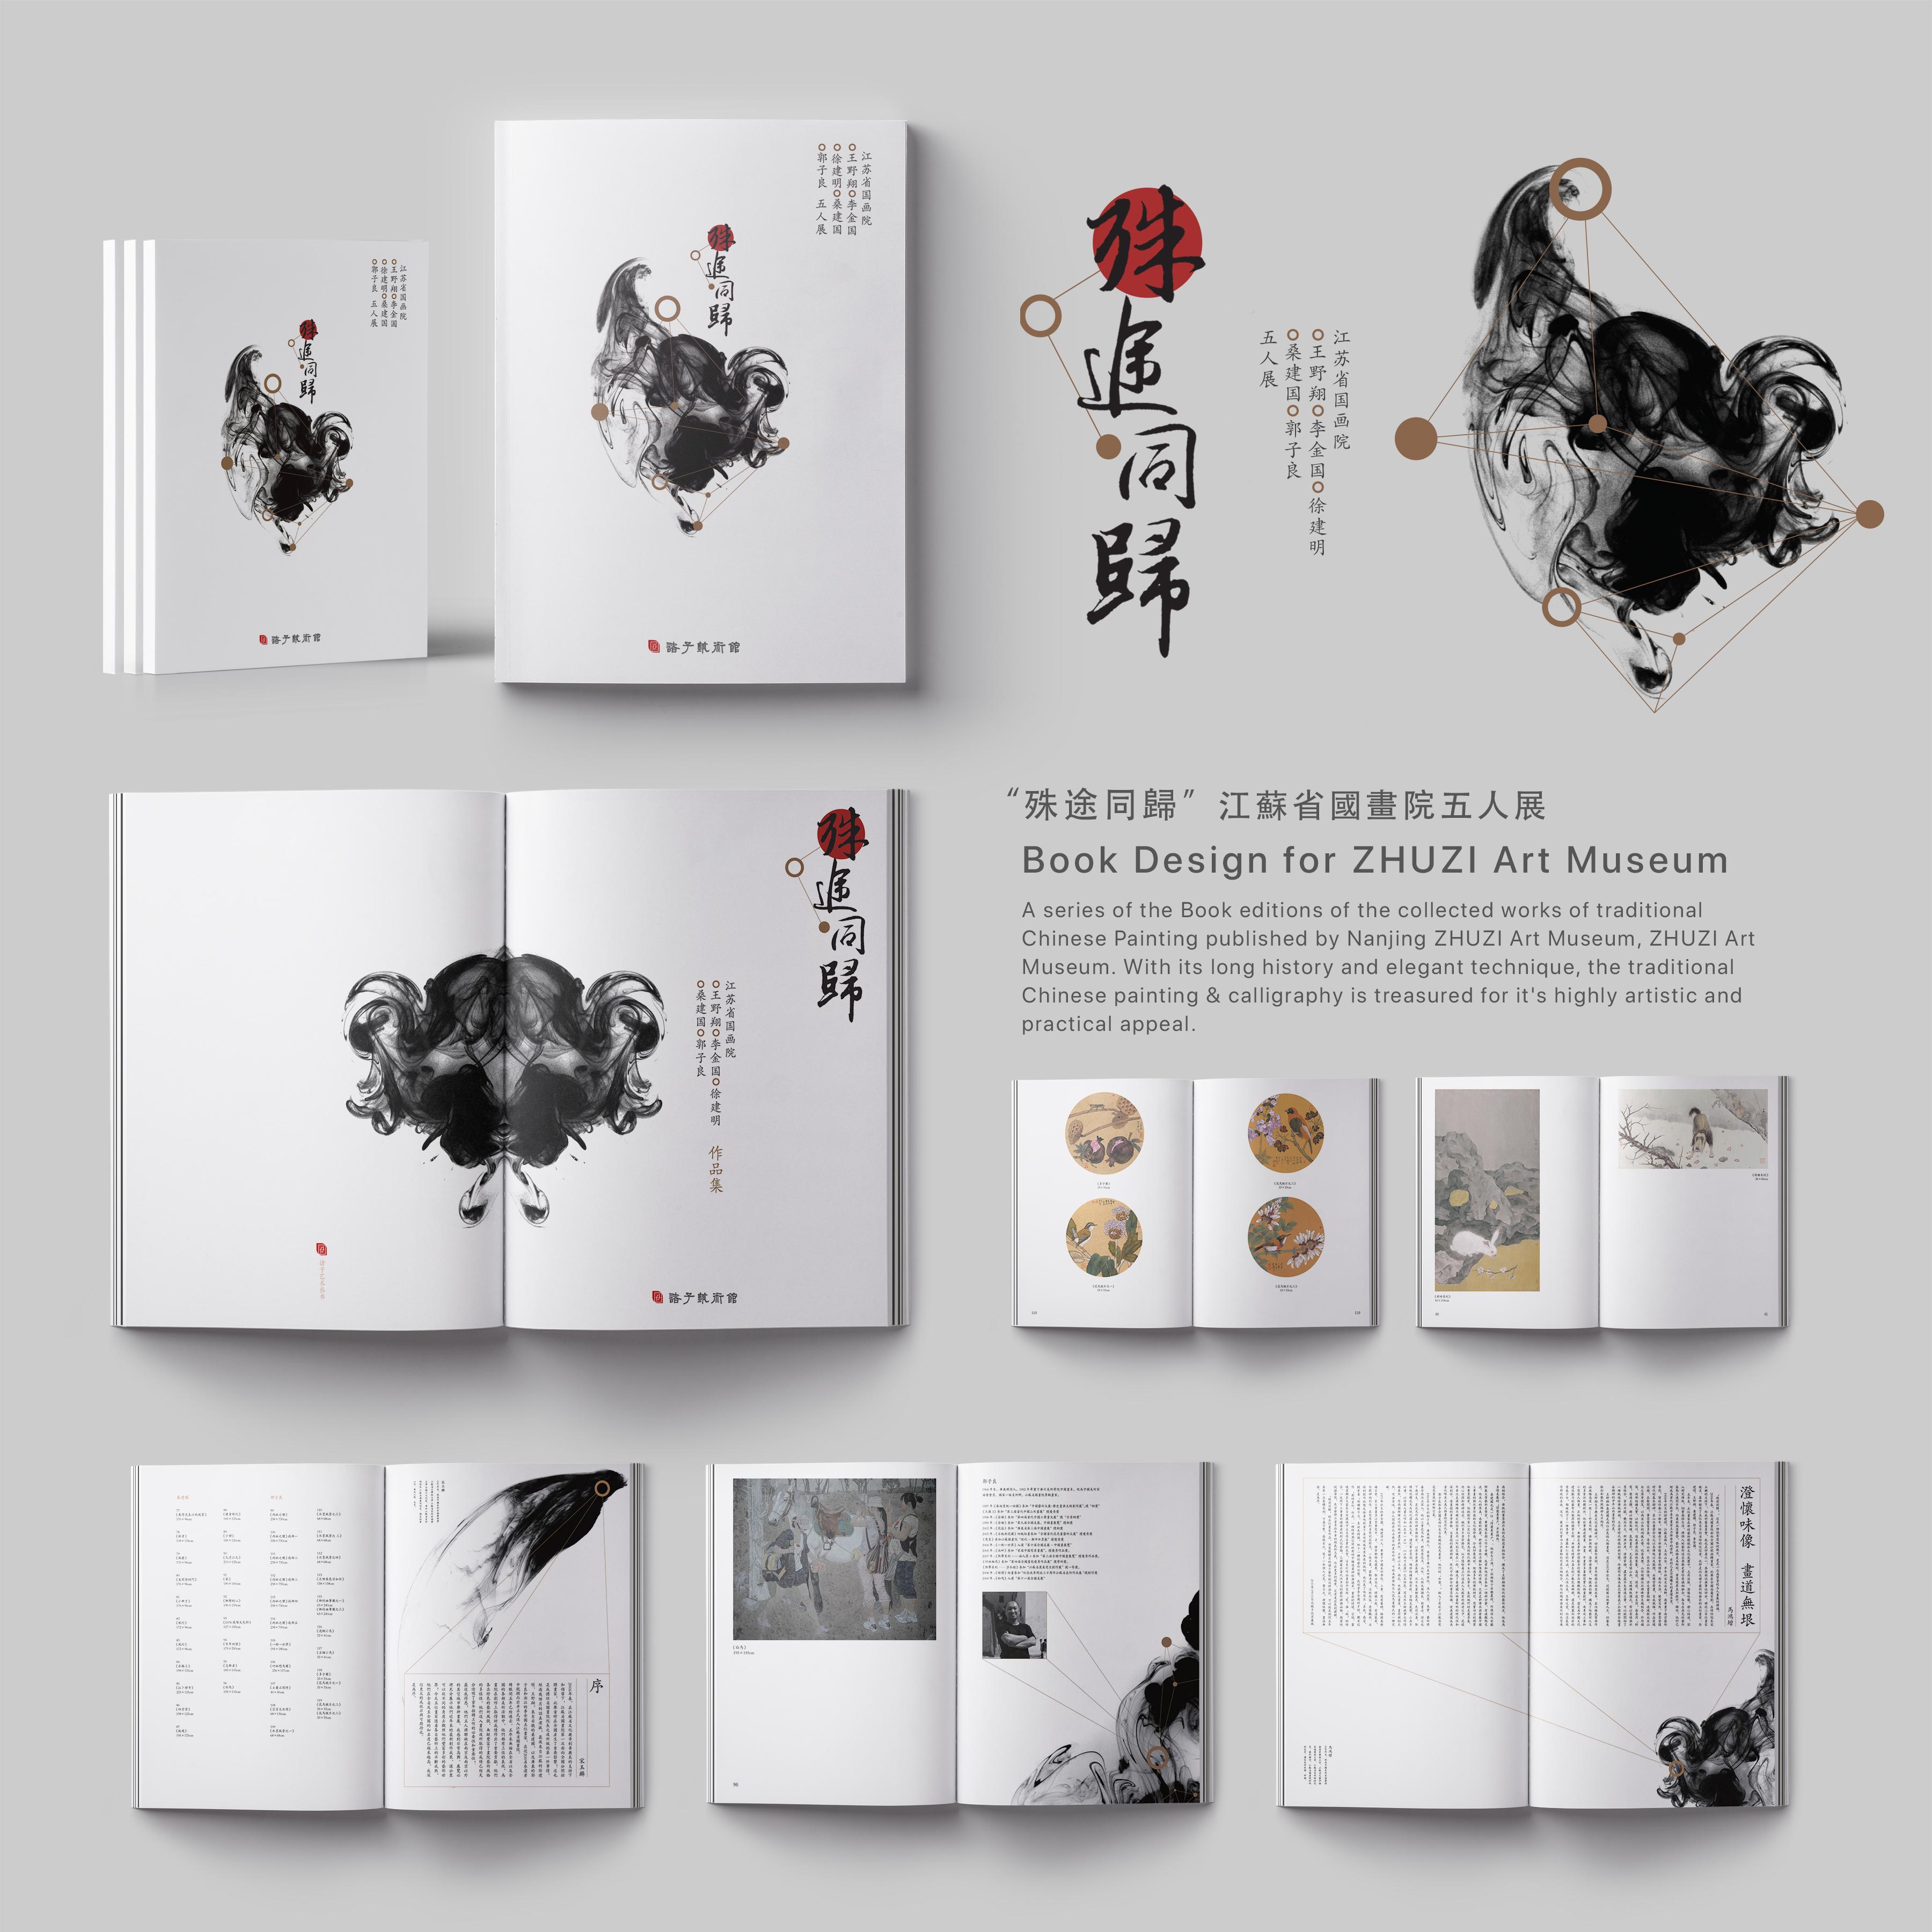 Book Design for ZHUZI Art Museum